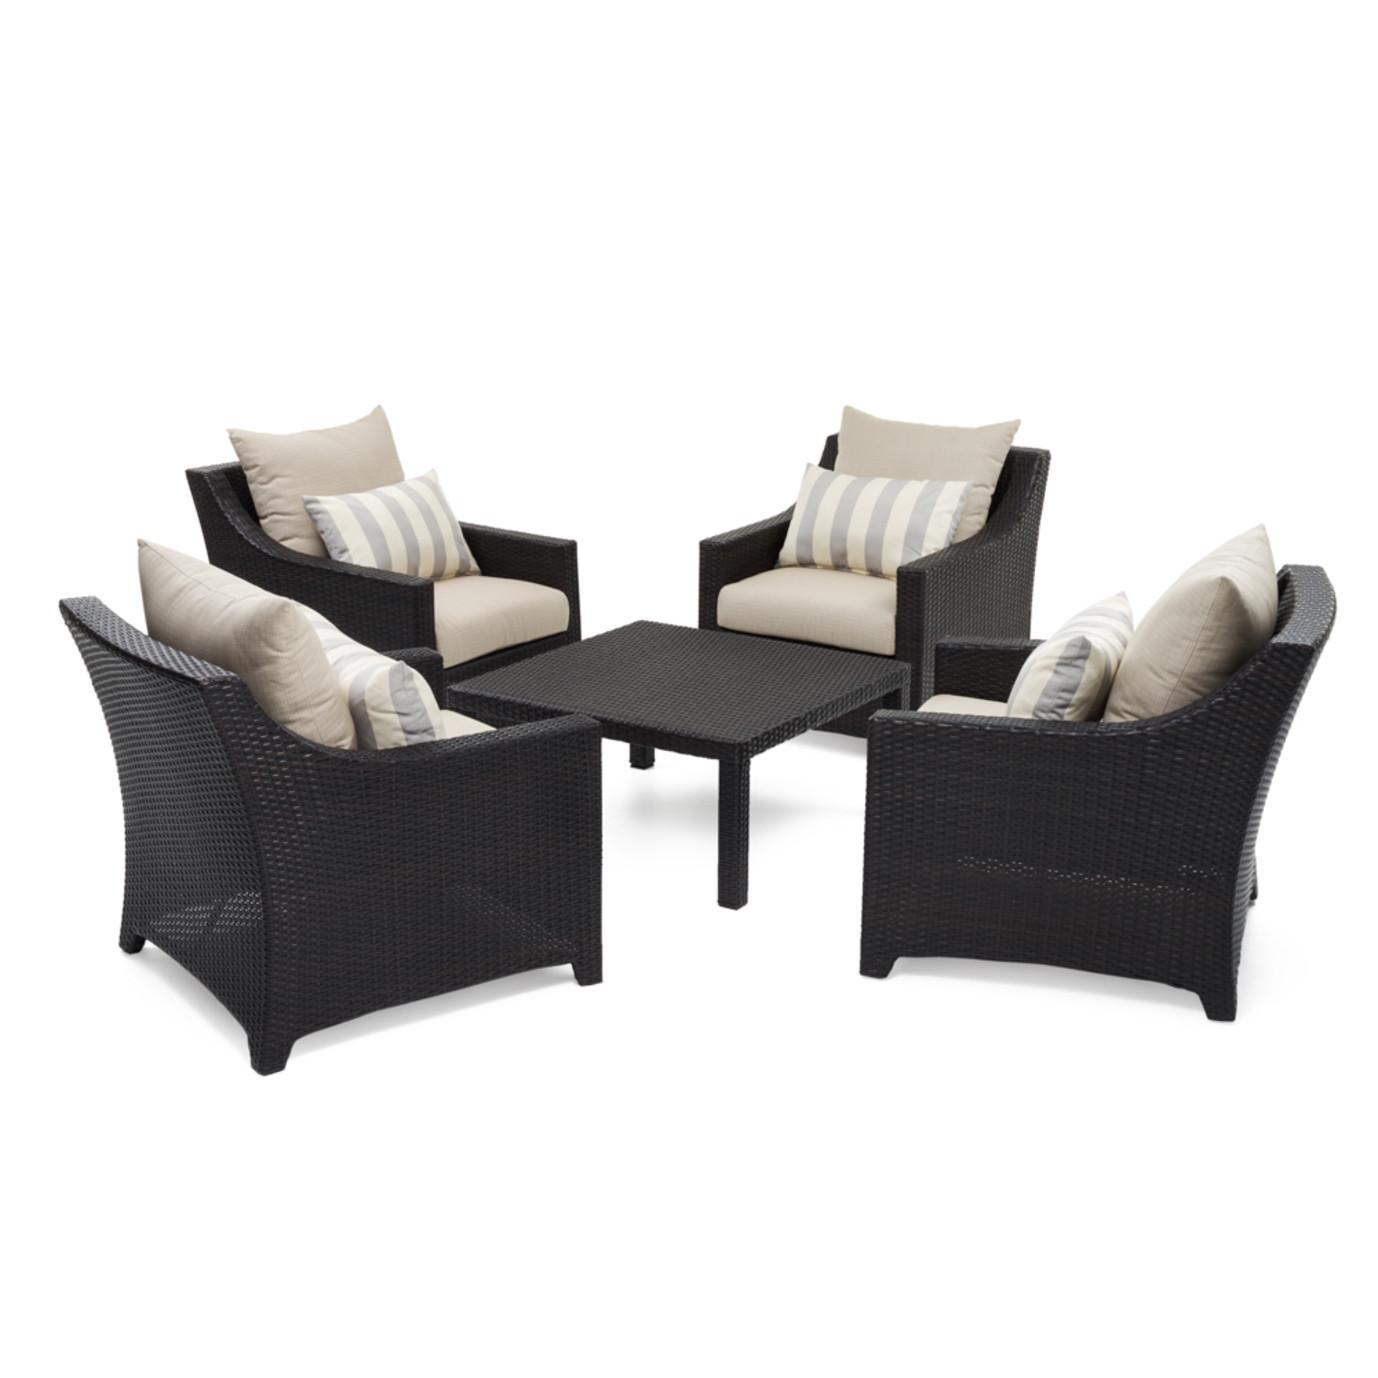 Deco™ 5pc Club & Table Chat Set - Slate Grey